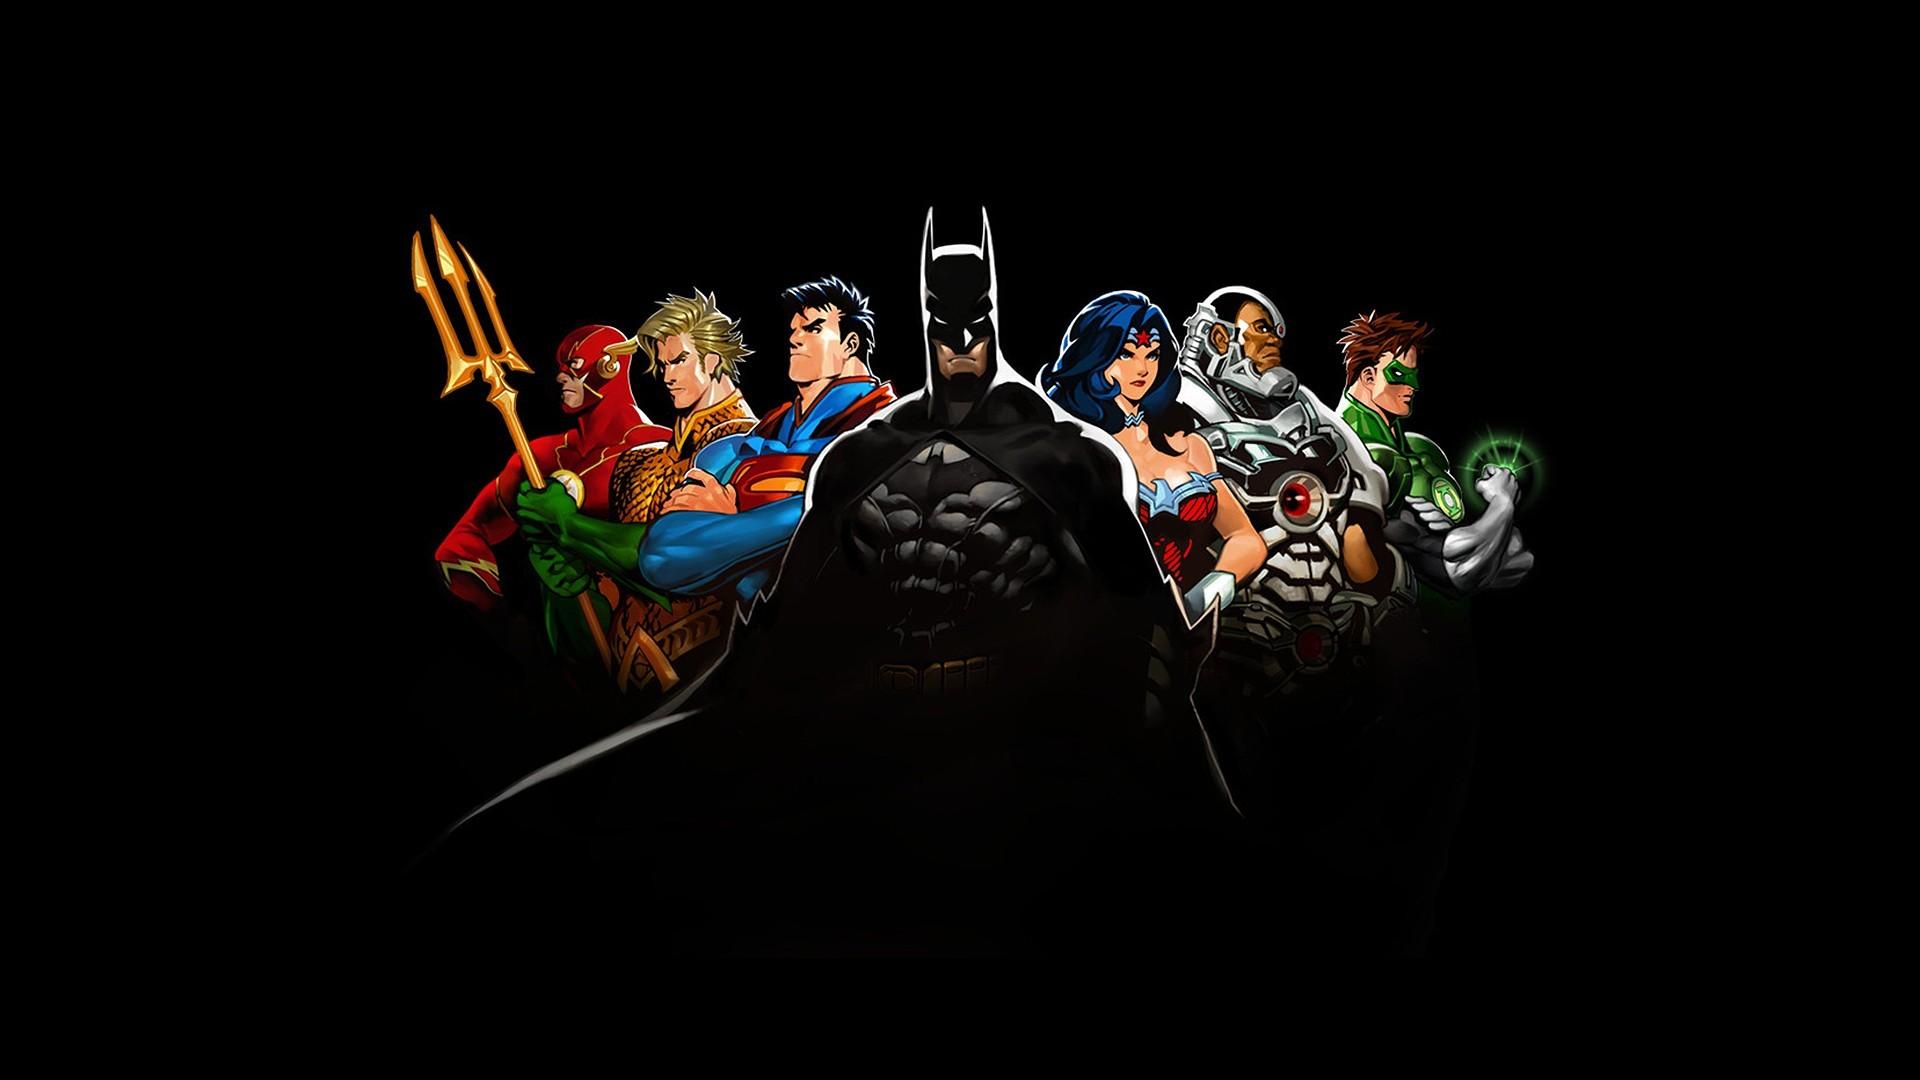 Justice League Hd Wallpapers Free Download Dc Comics Hd Wallpapers Pixelstalk Net